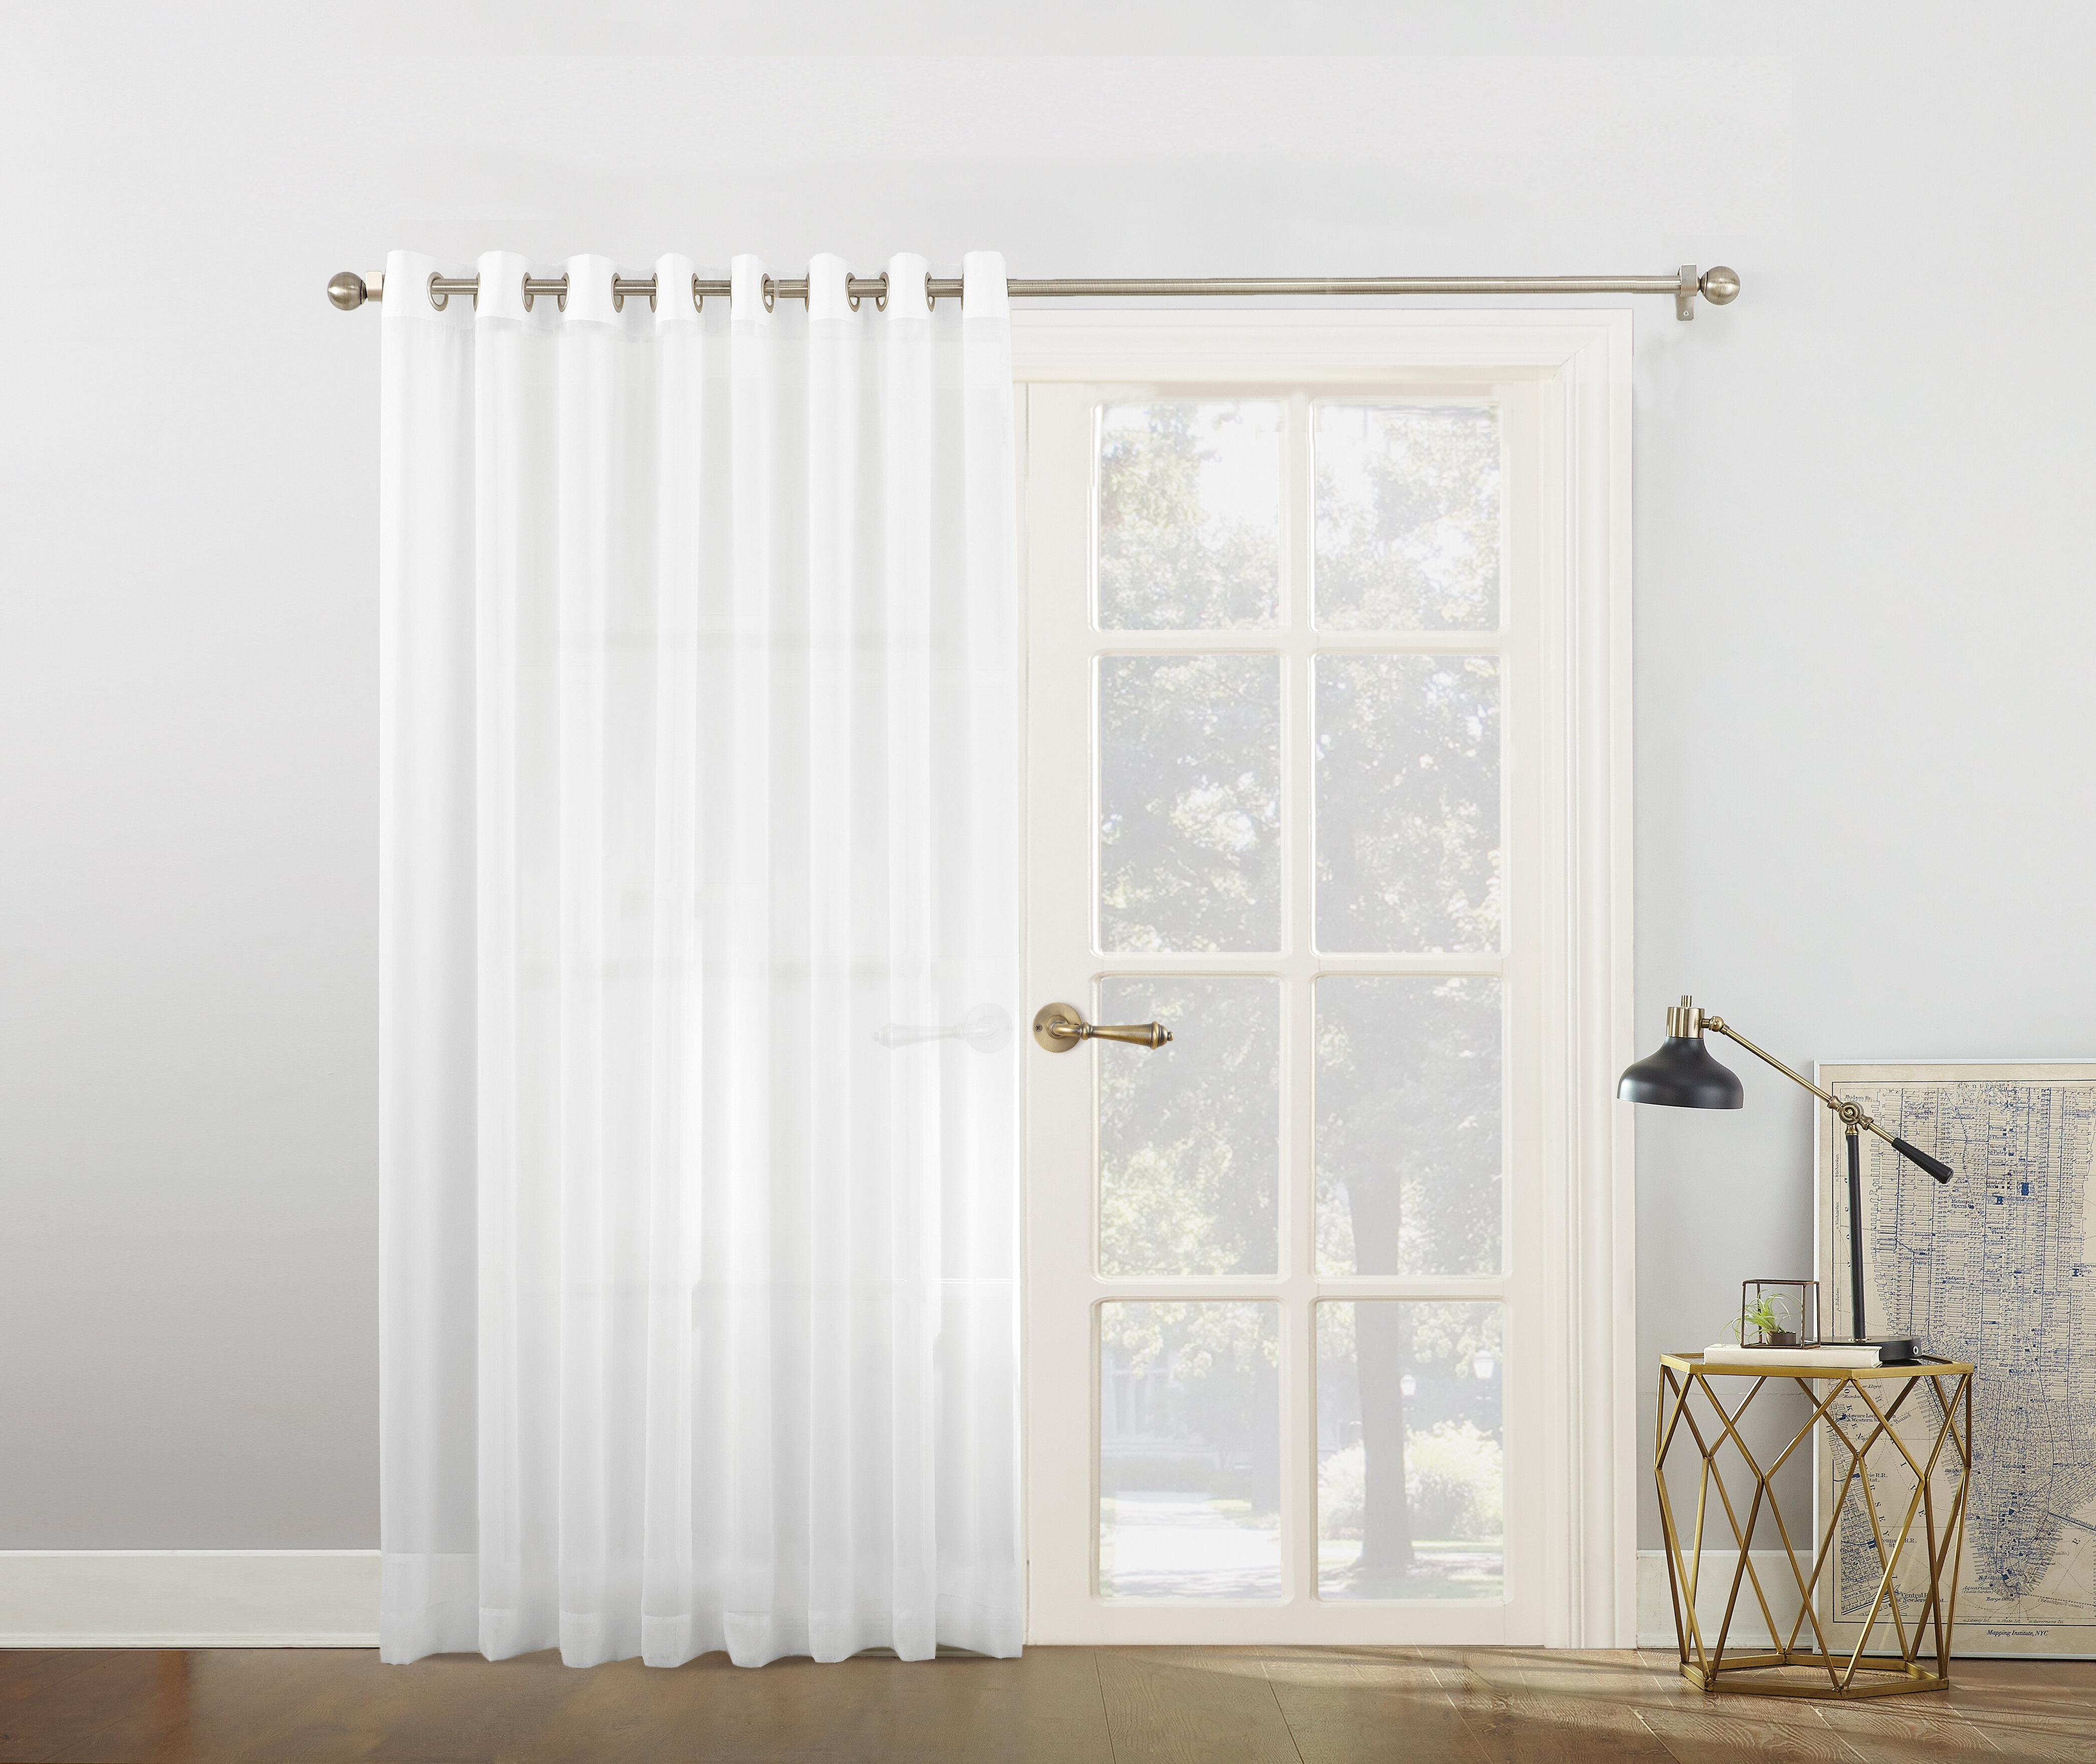 918 Emily Voile Sliding Door Patio Solid Semi-Sheer Grommet Single Curtain Panel \u0026 Reviews | Wayfair  sc 1 st  Wayfair & No. 918 Emily Voile Sliding Door Patio Solid Semi-Sheer Grommet ...